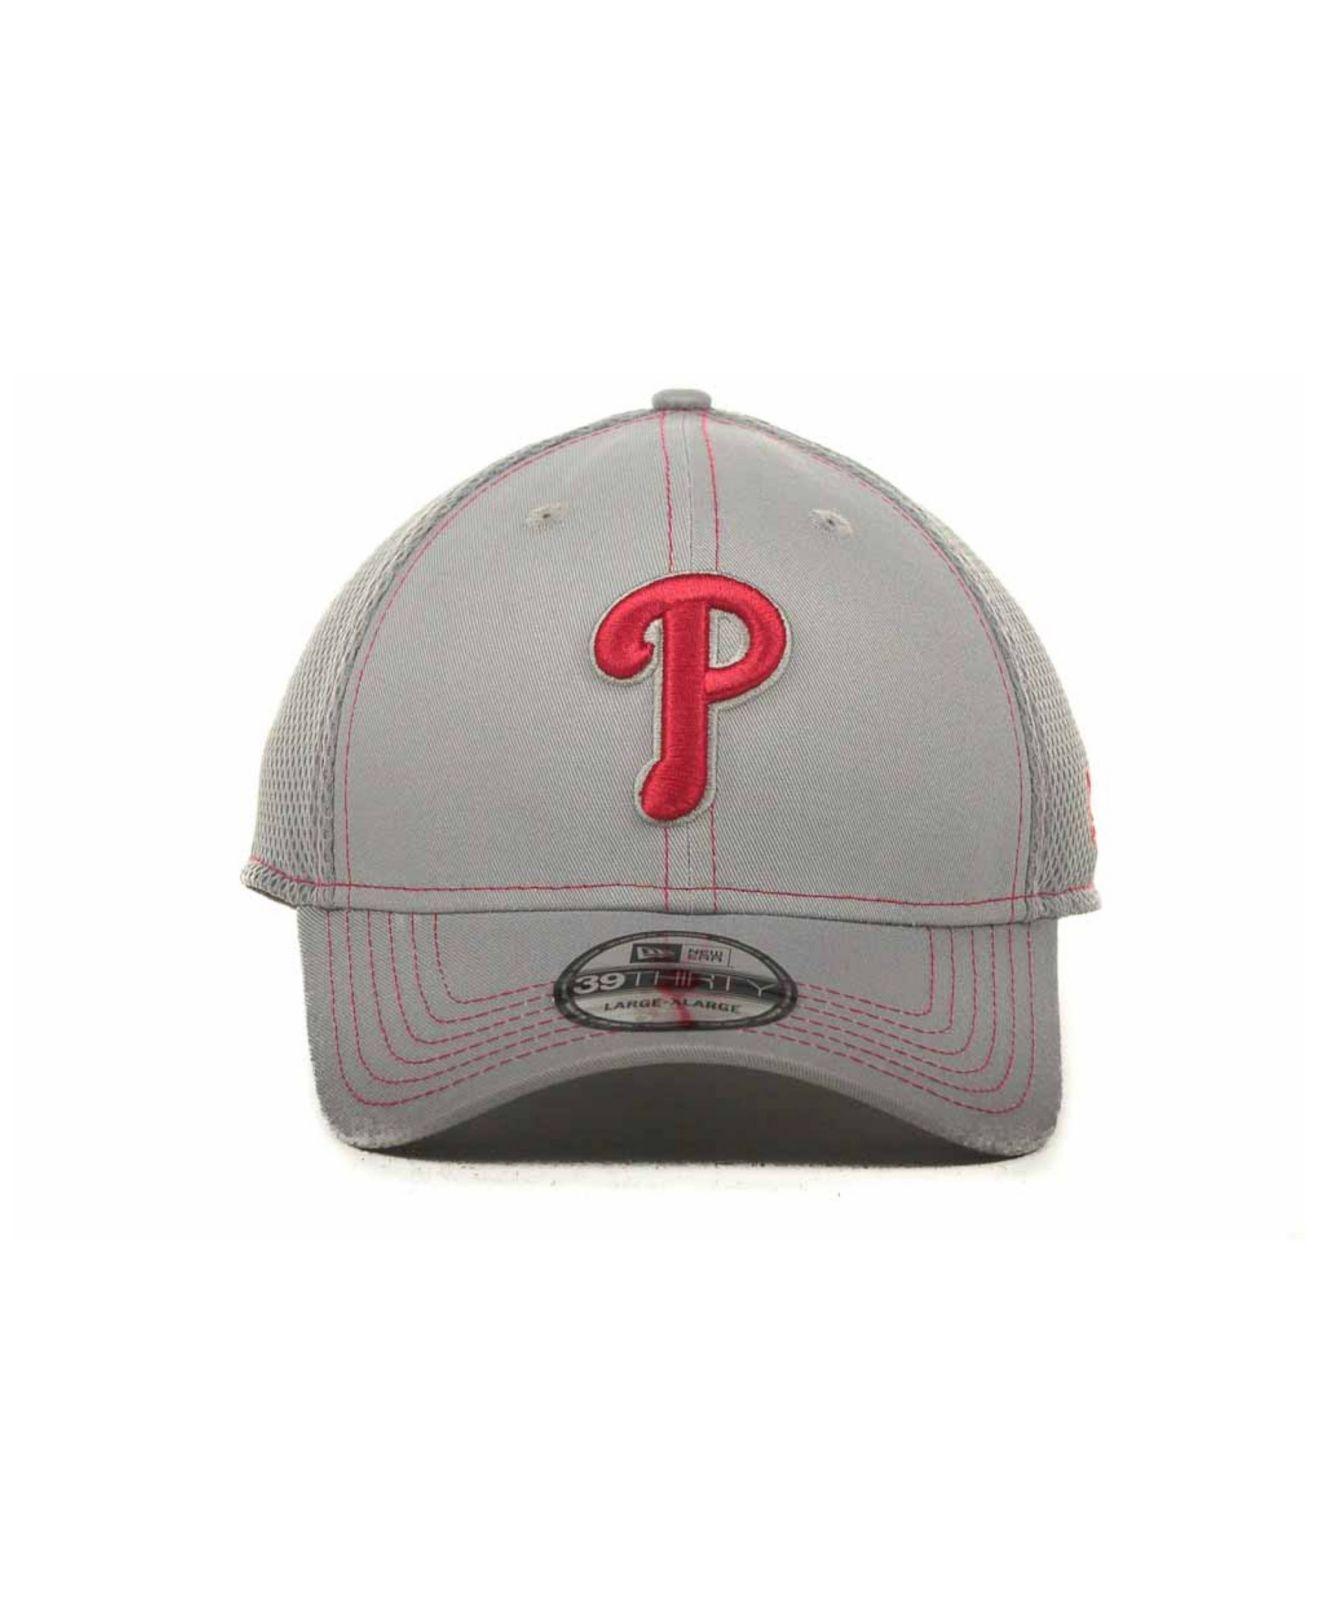 reputable site ee1bb 9b8c9 KTZ Philadelphia Phillies Gray Neo 39thirty Cap in Gray for Men - Lyst